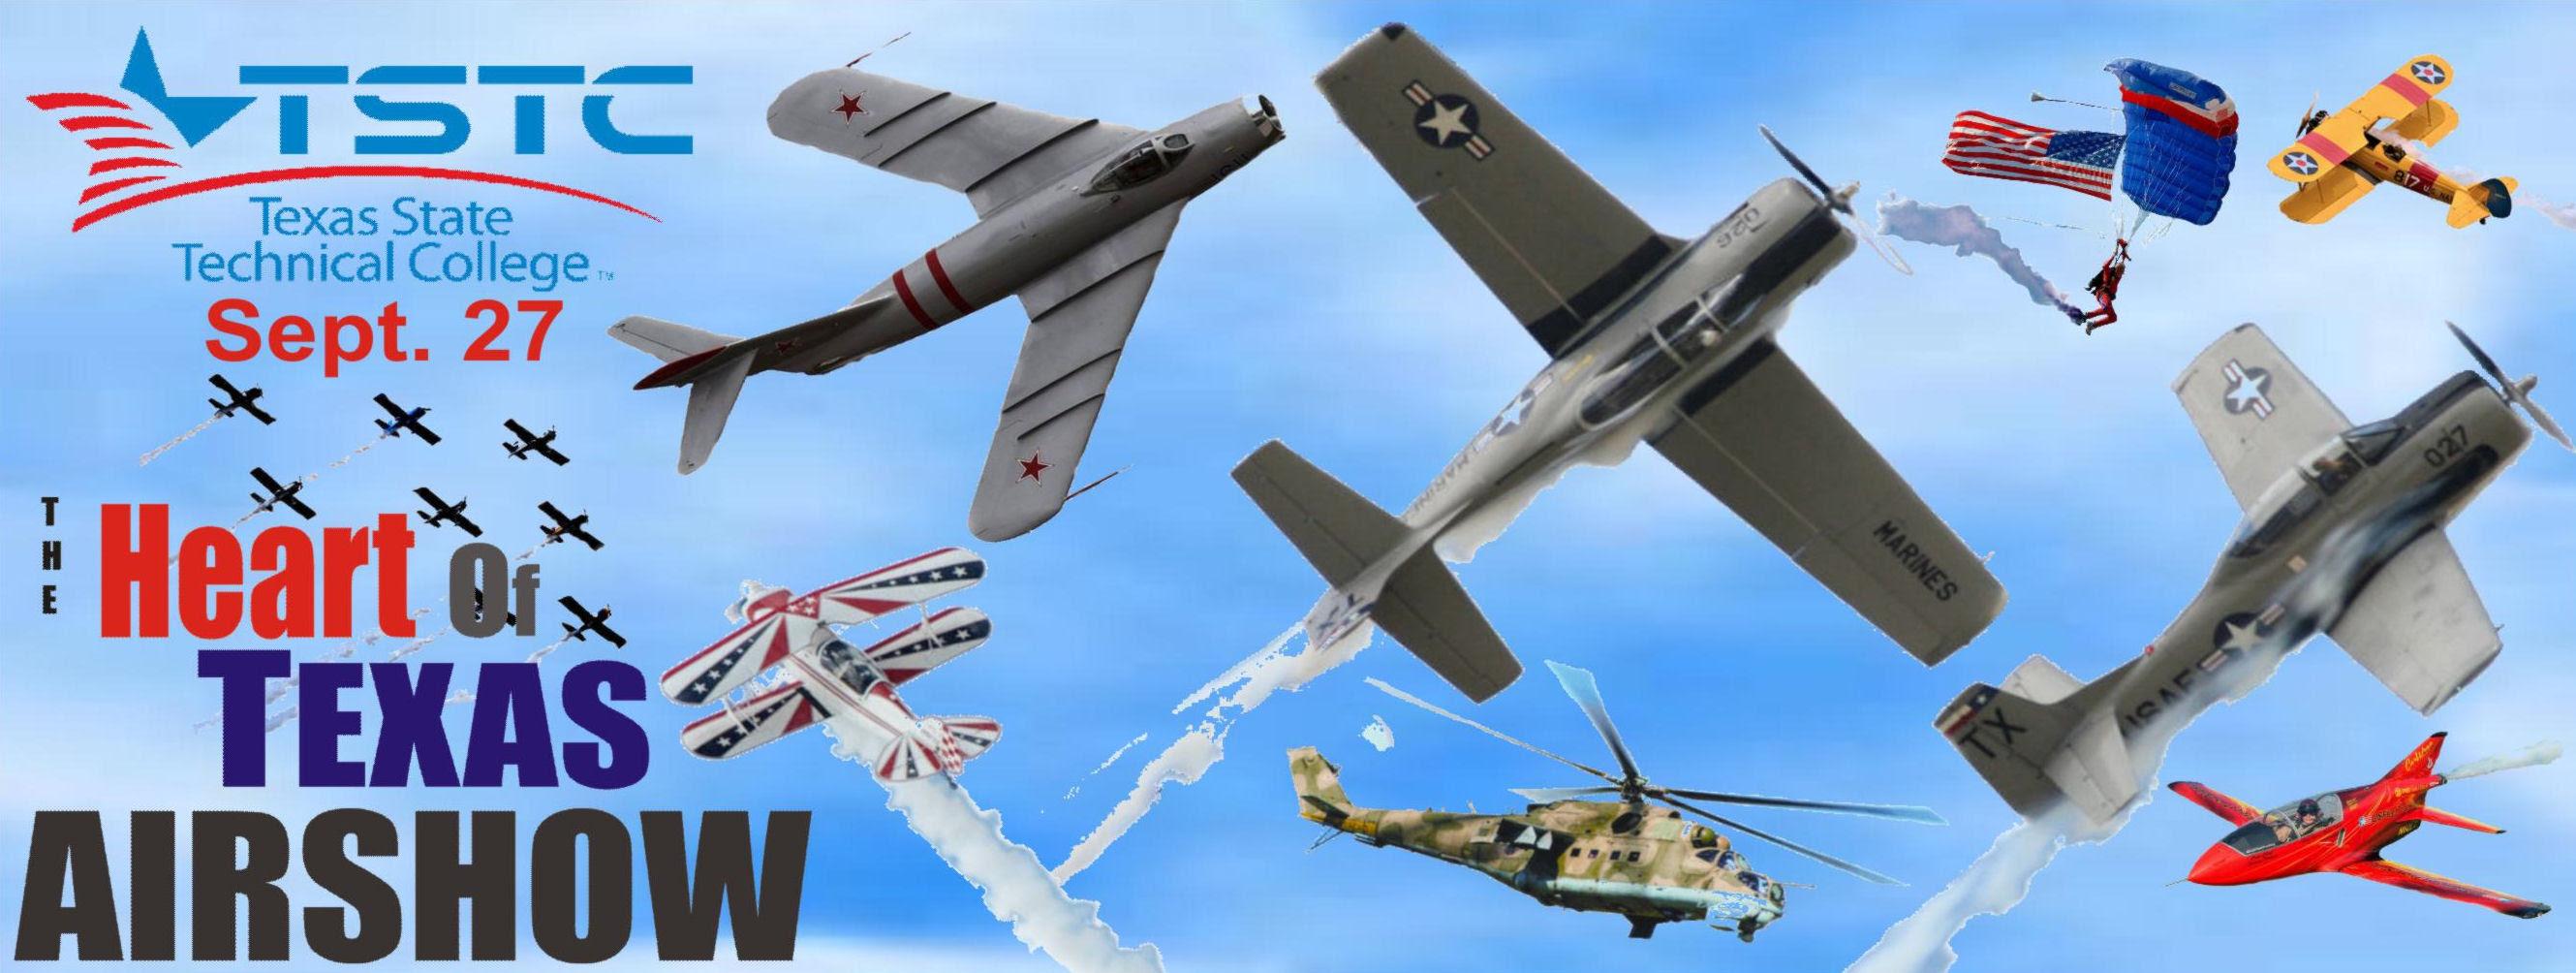 http://www.warbirdsnews.com/airshow-news/jets-p-51-mustang-heart-texas-airshow.html